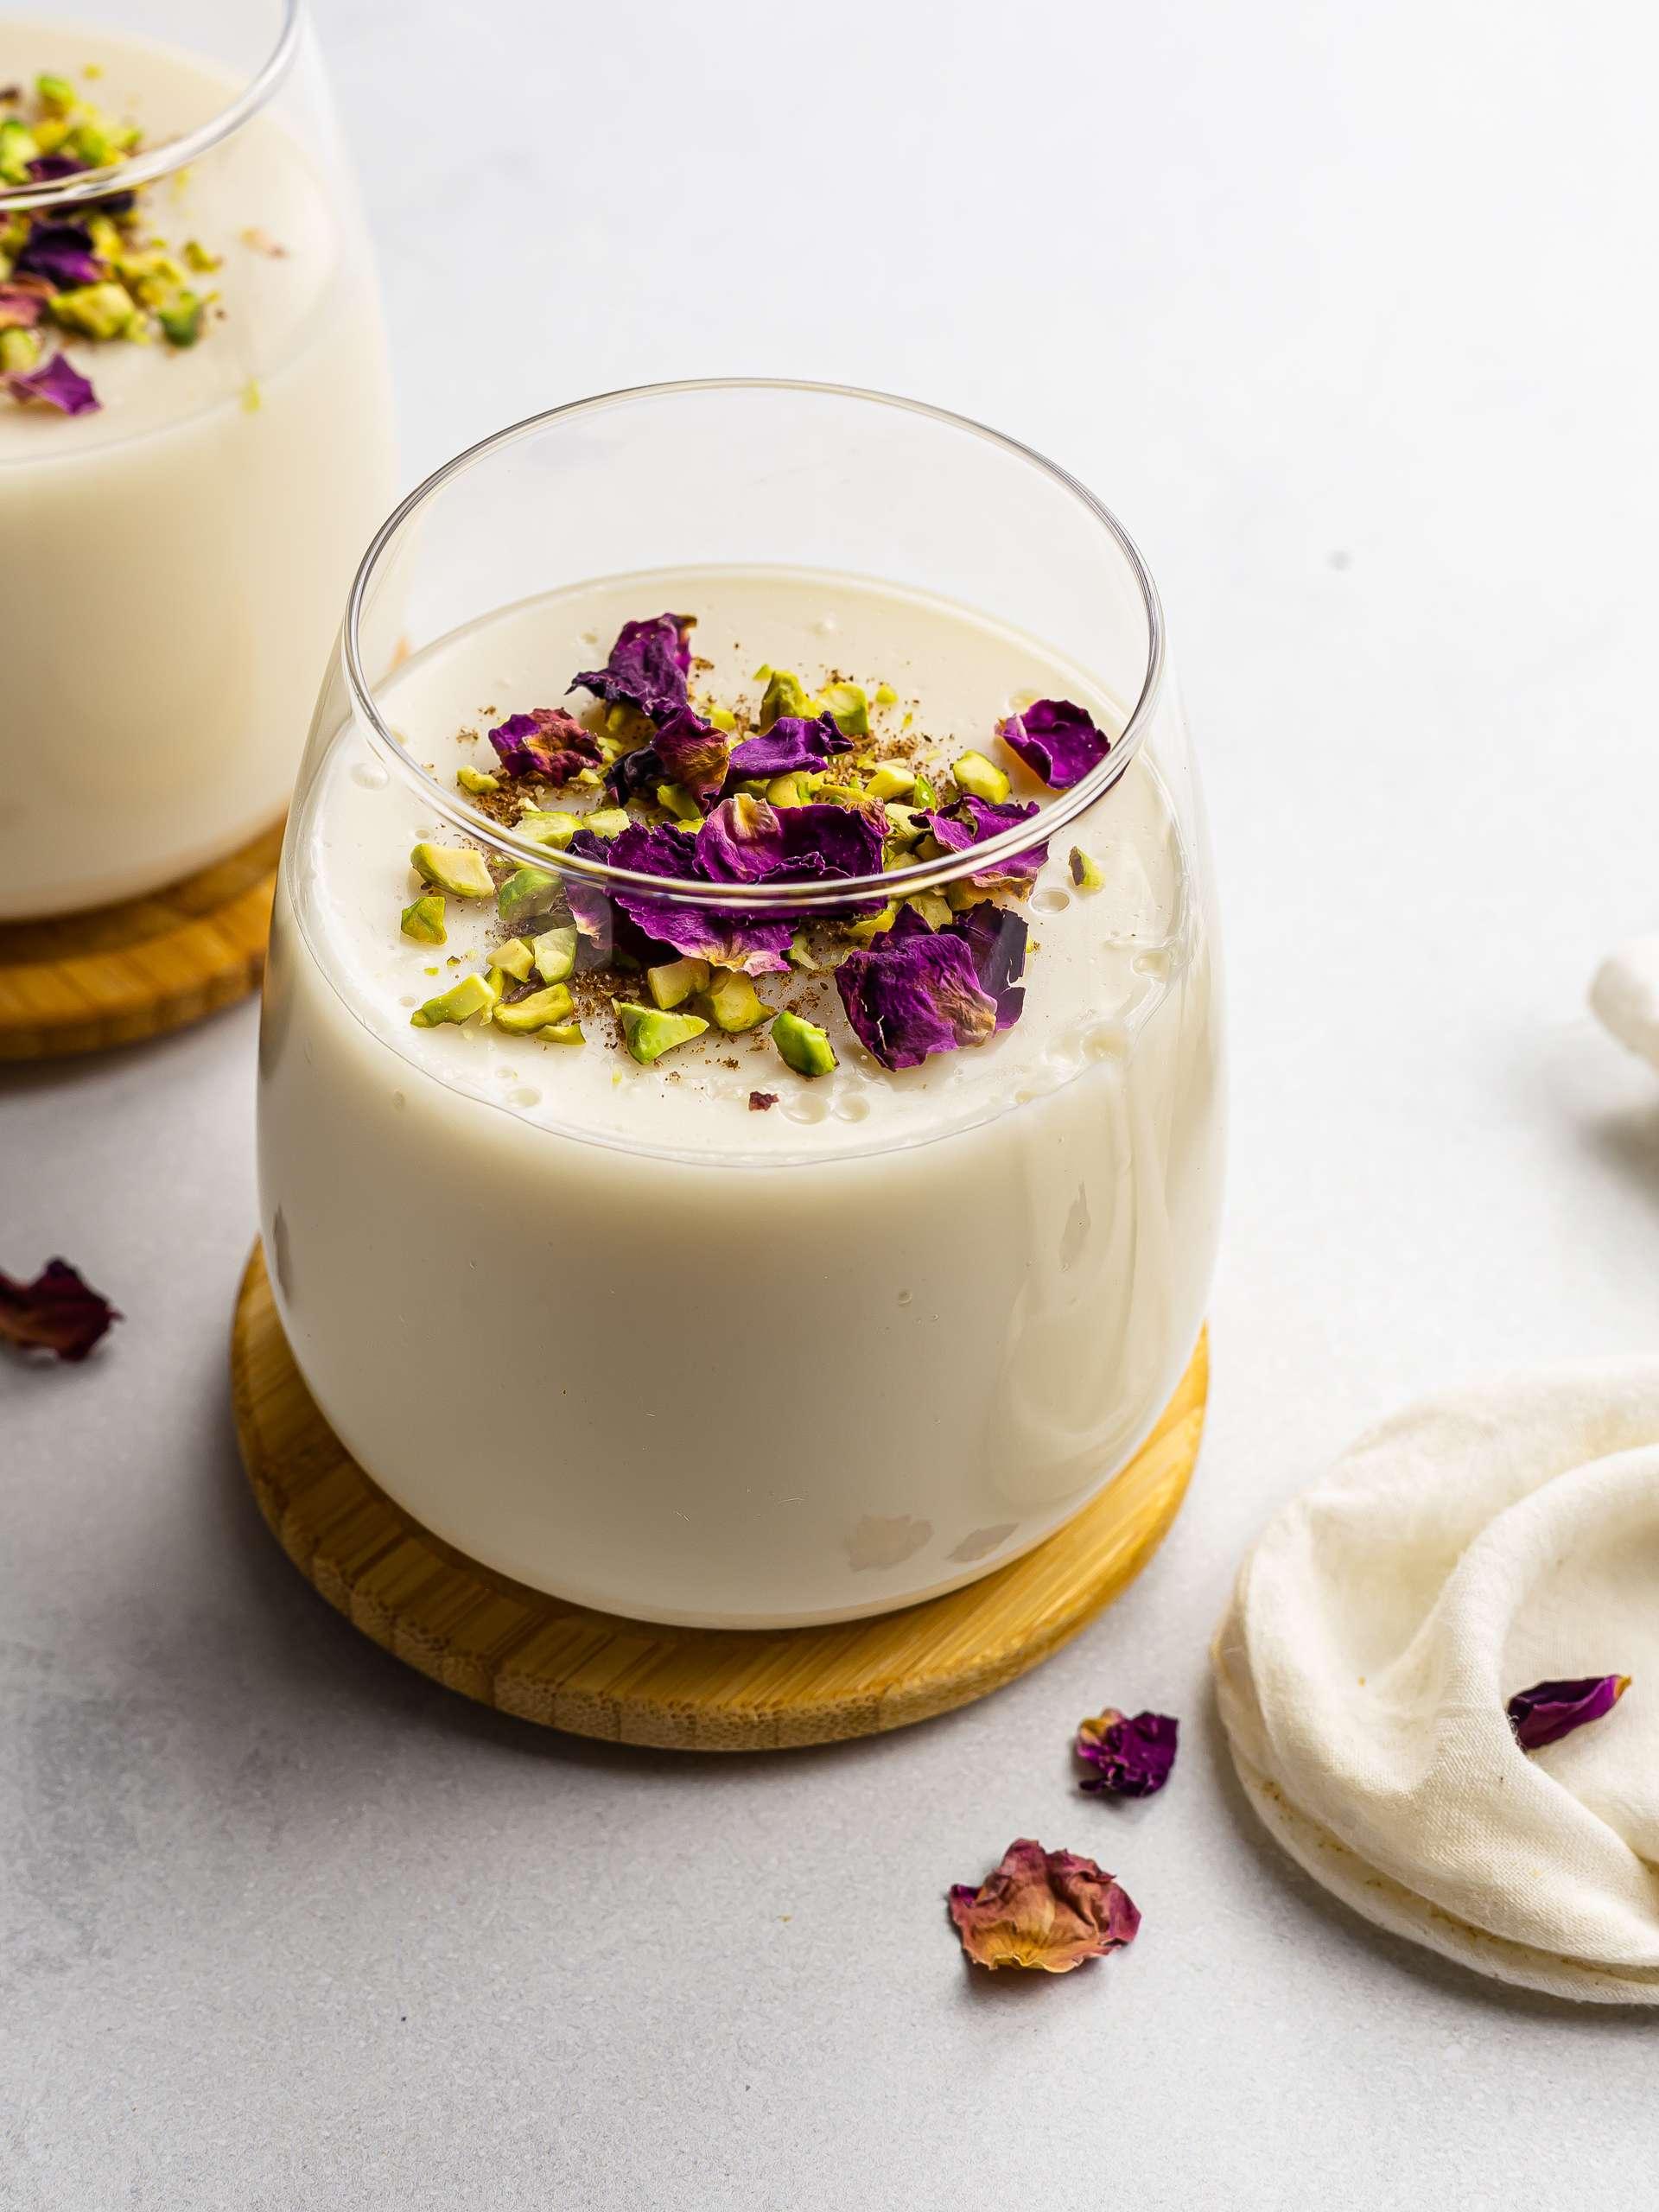 Vegan Muhallebi (Middle Eastern Rose Pudding)